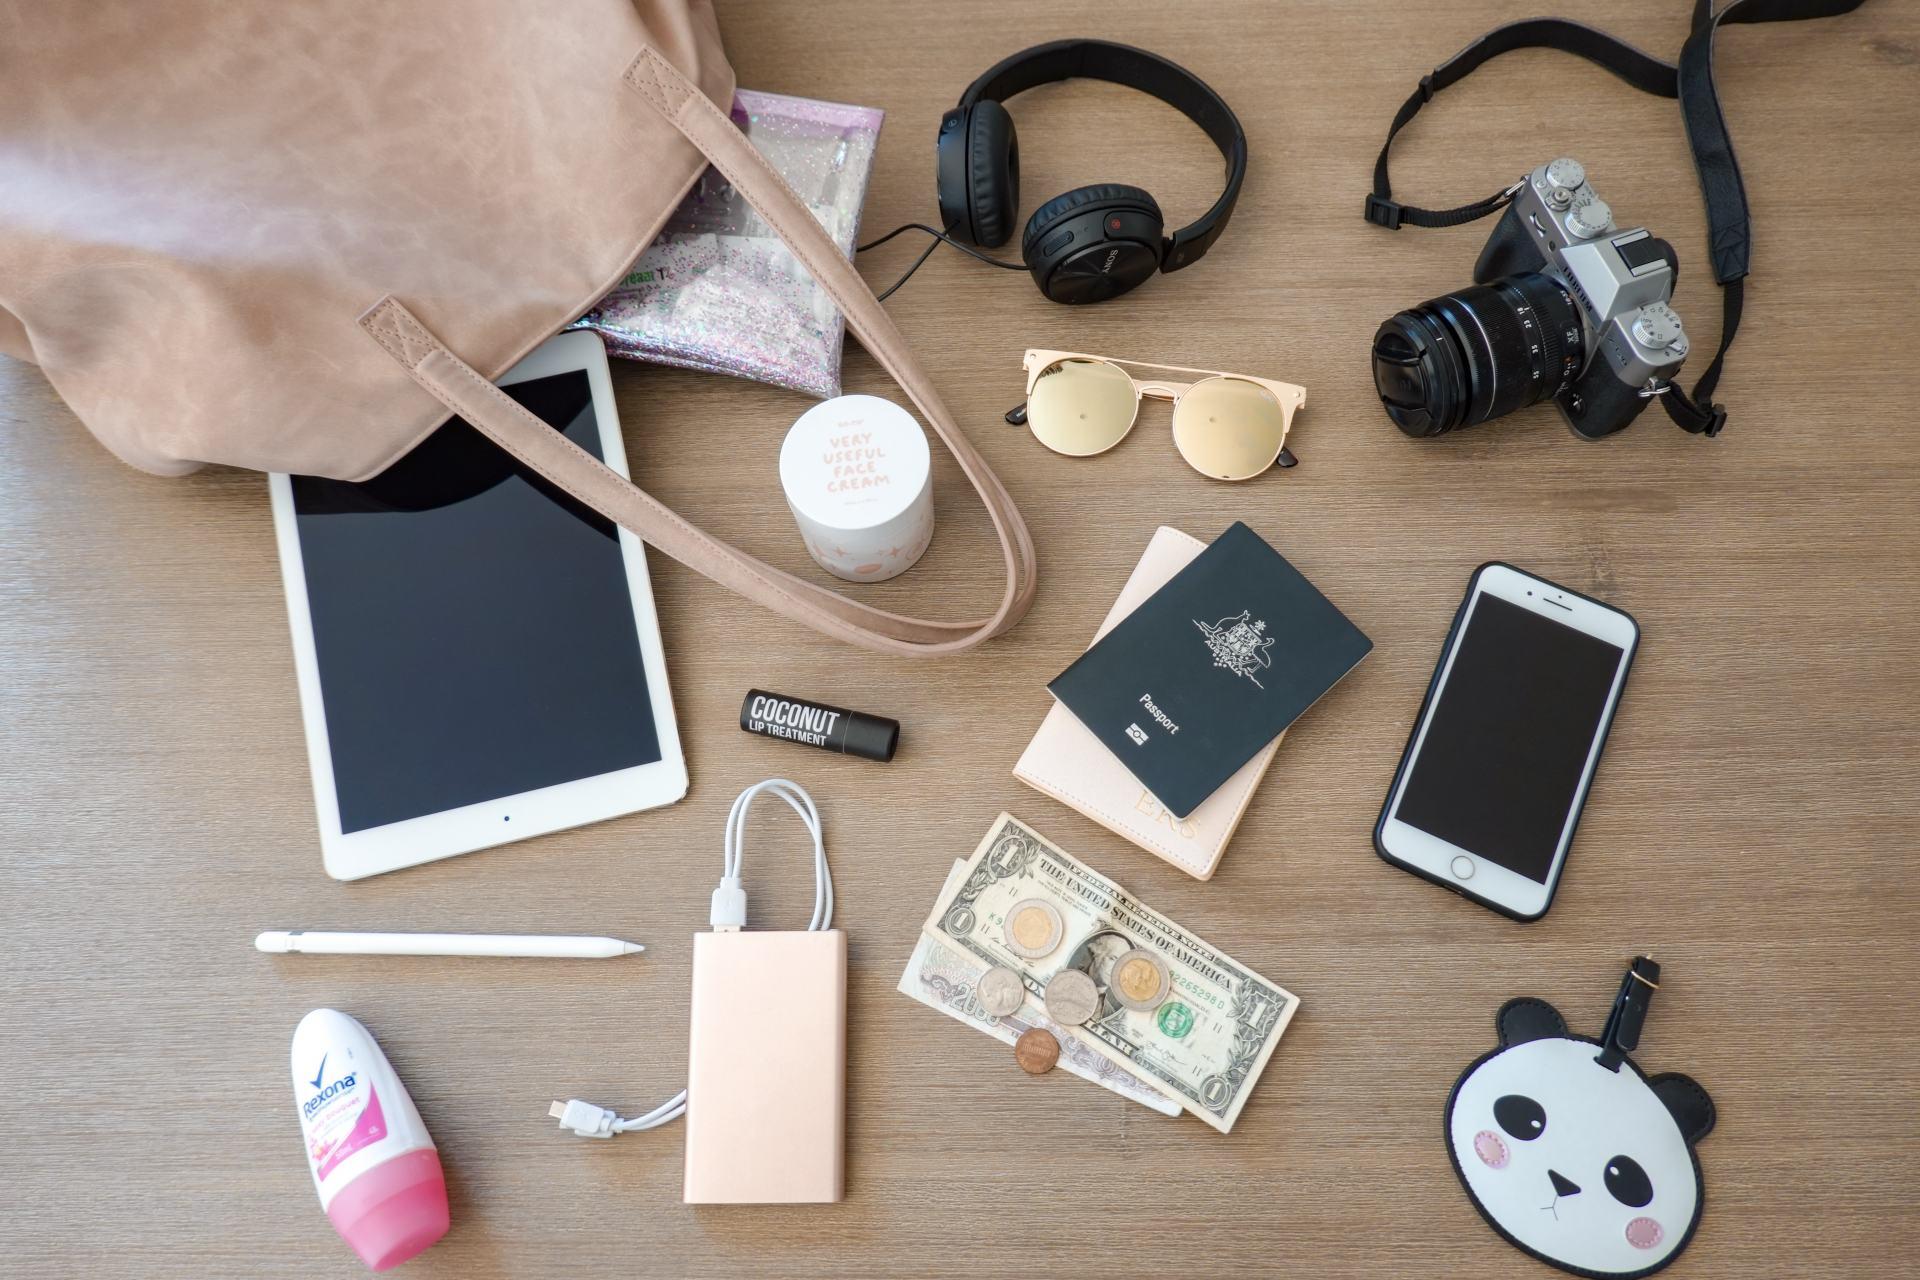 carry on handbag packing essentials